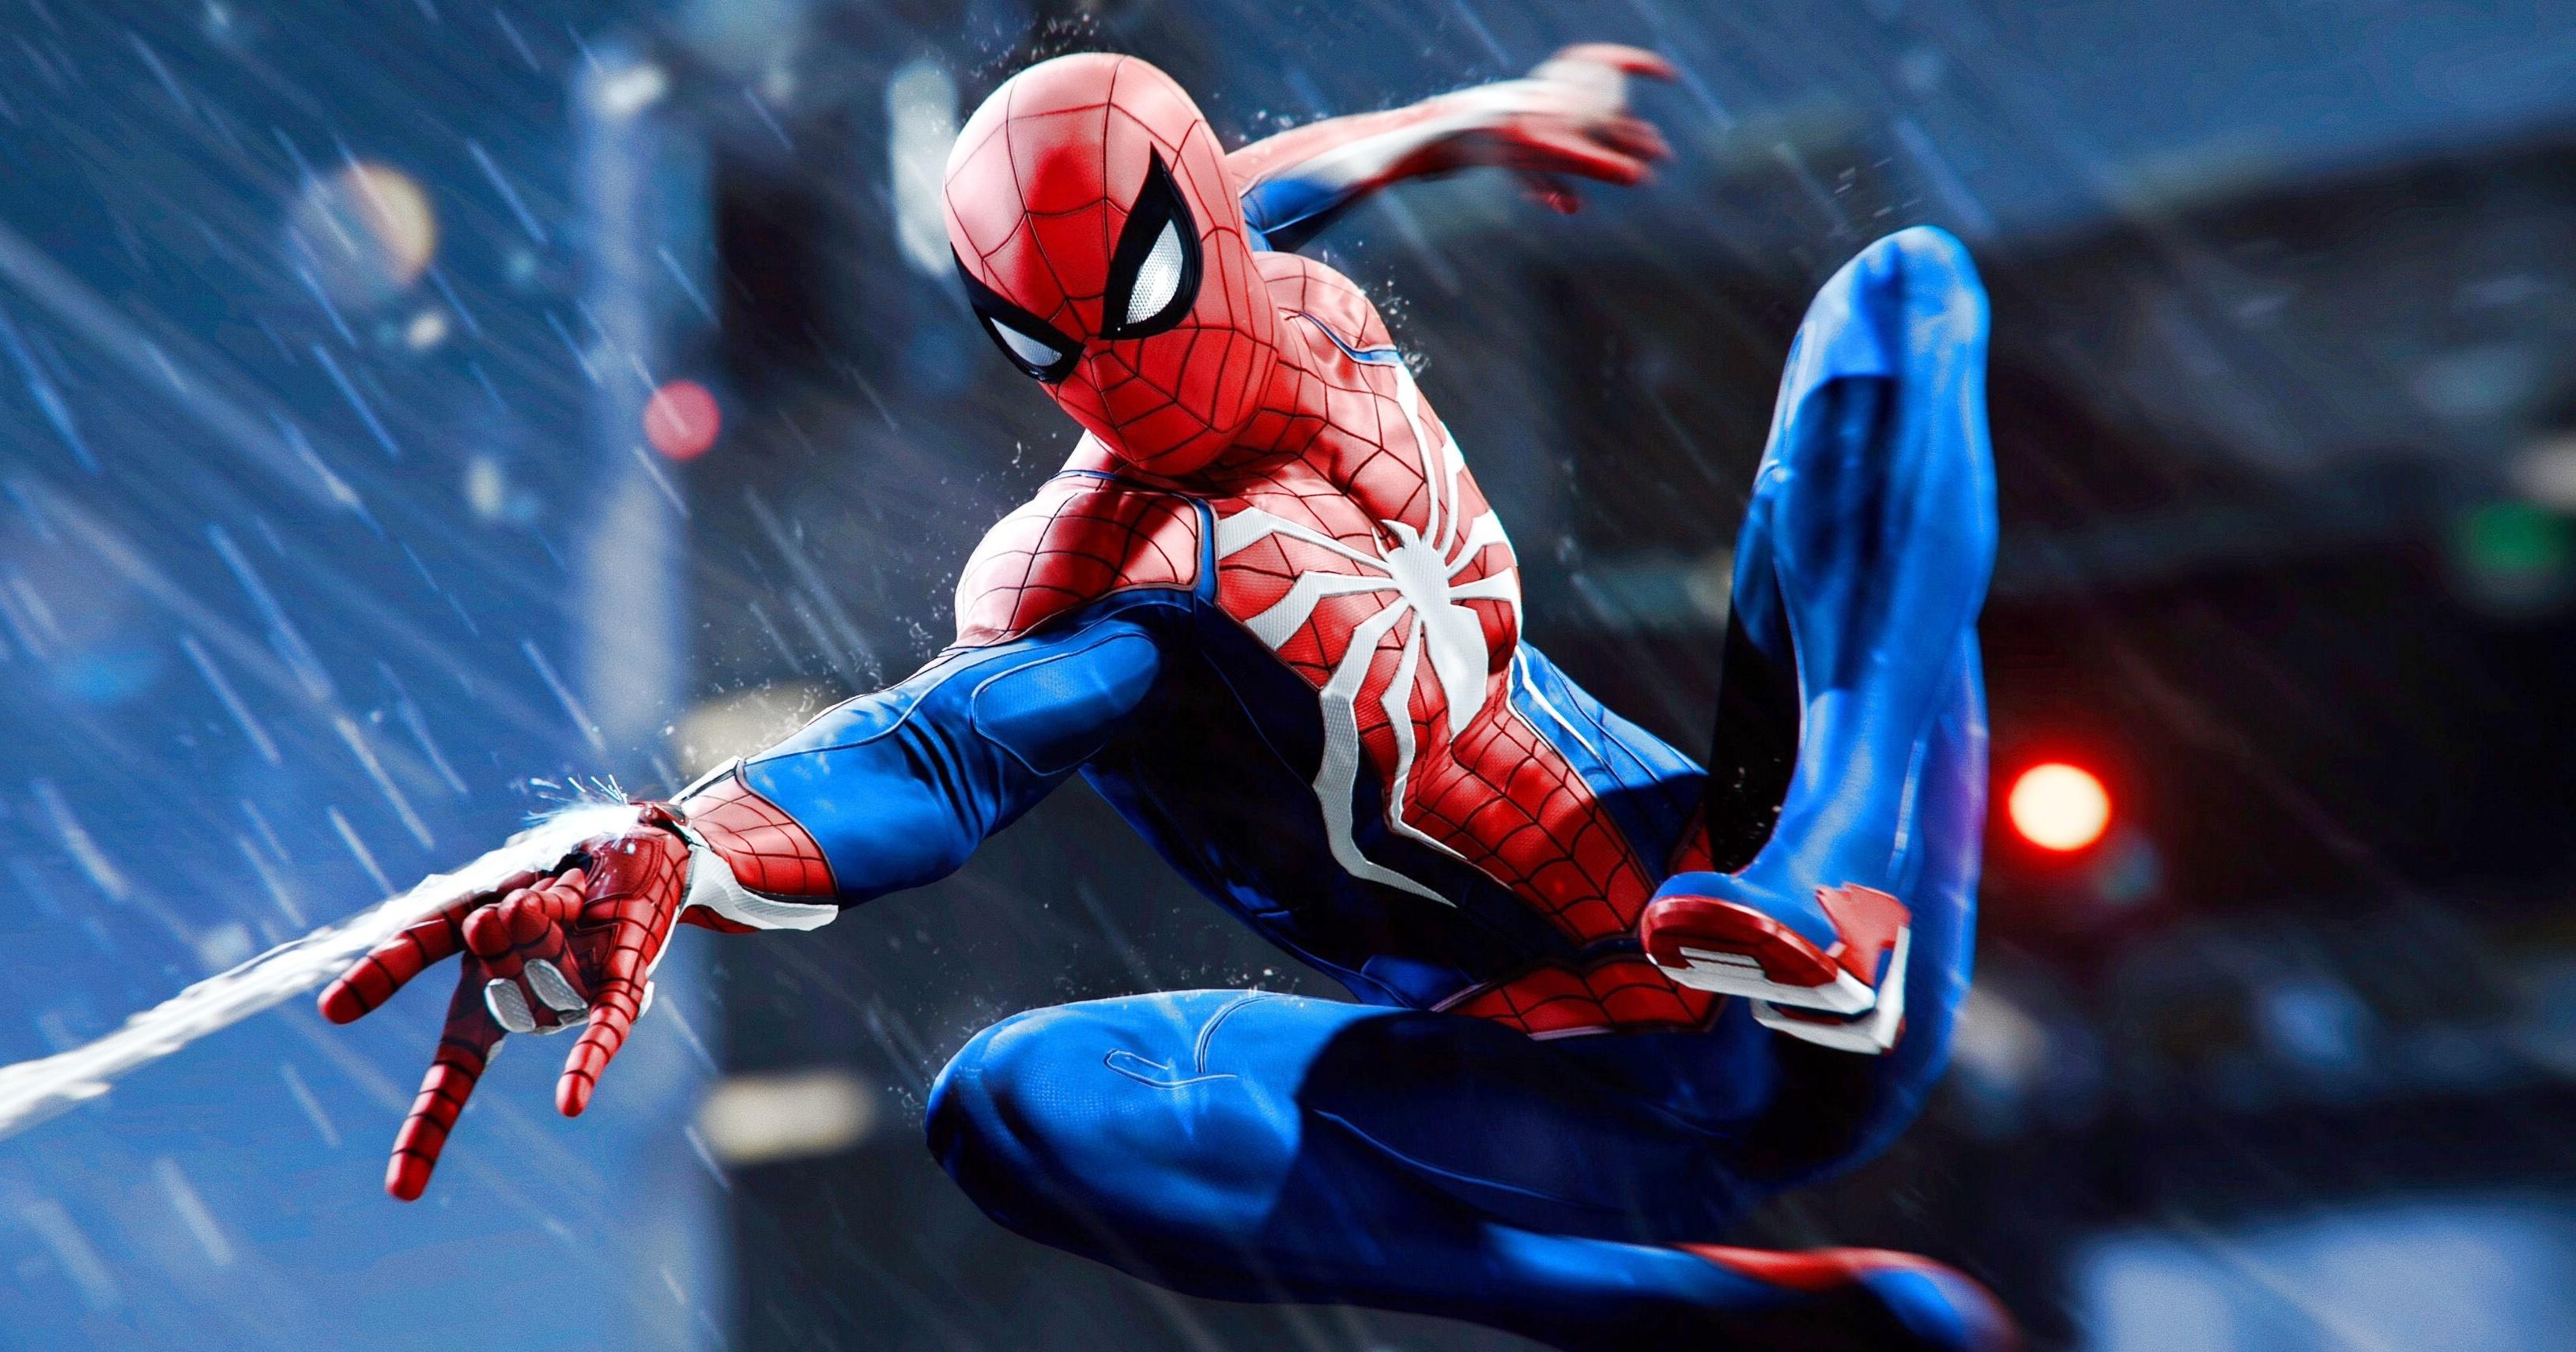 spider-man-teszt-fokep.jpg